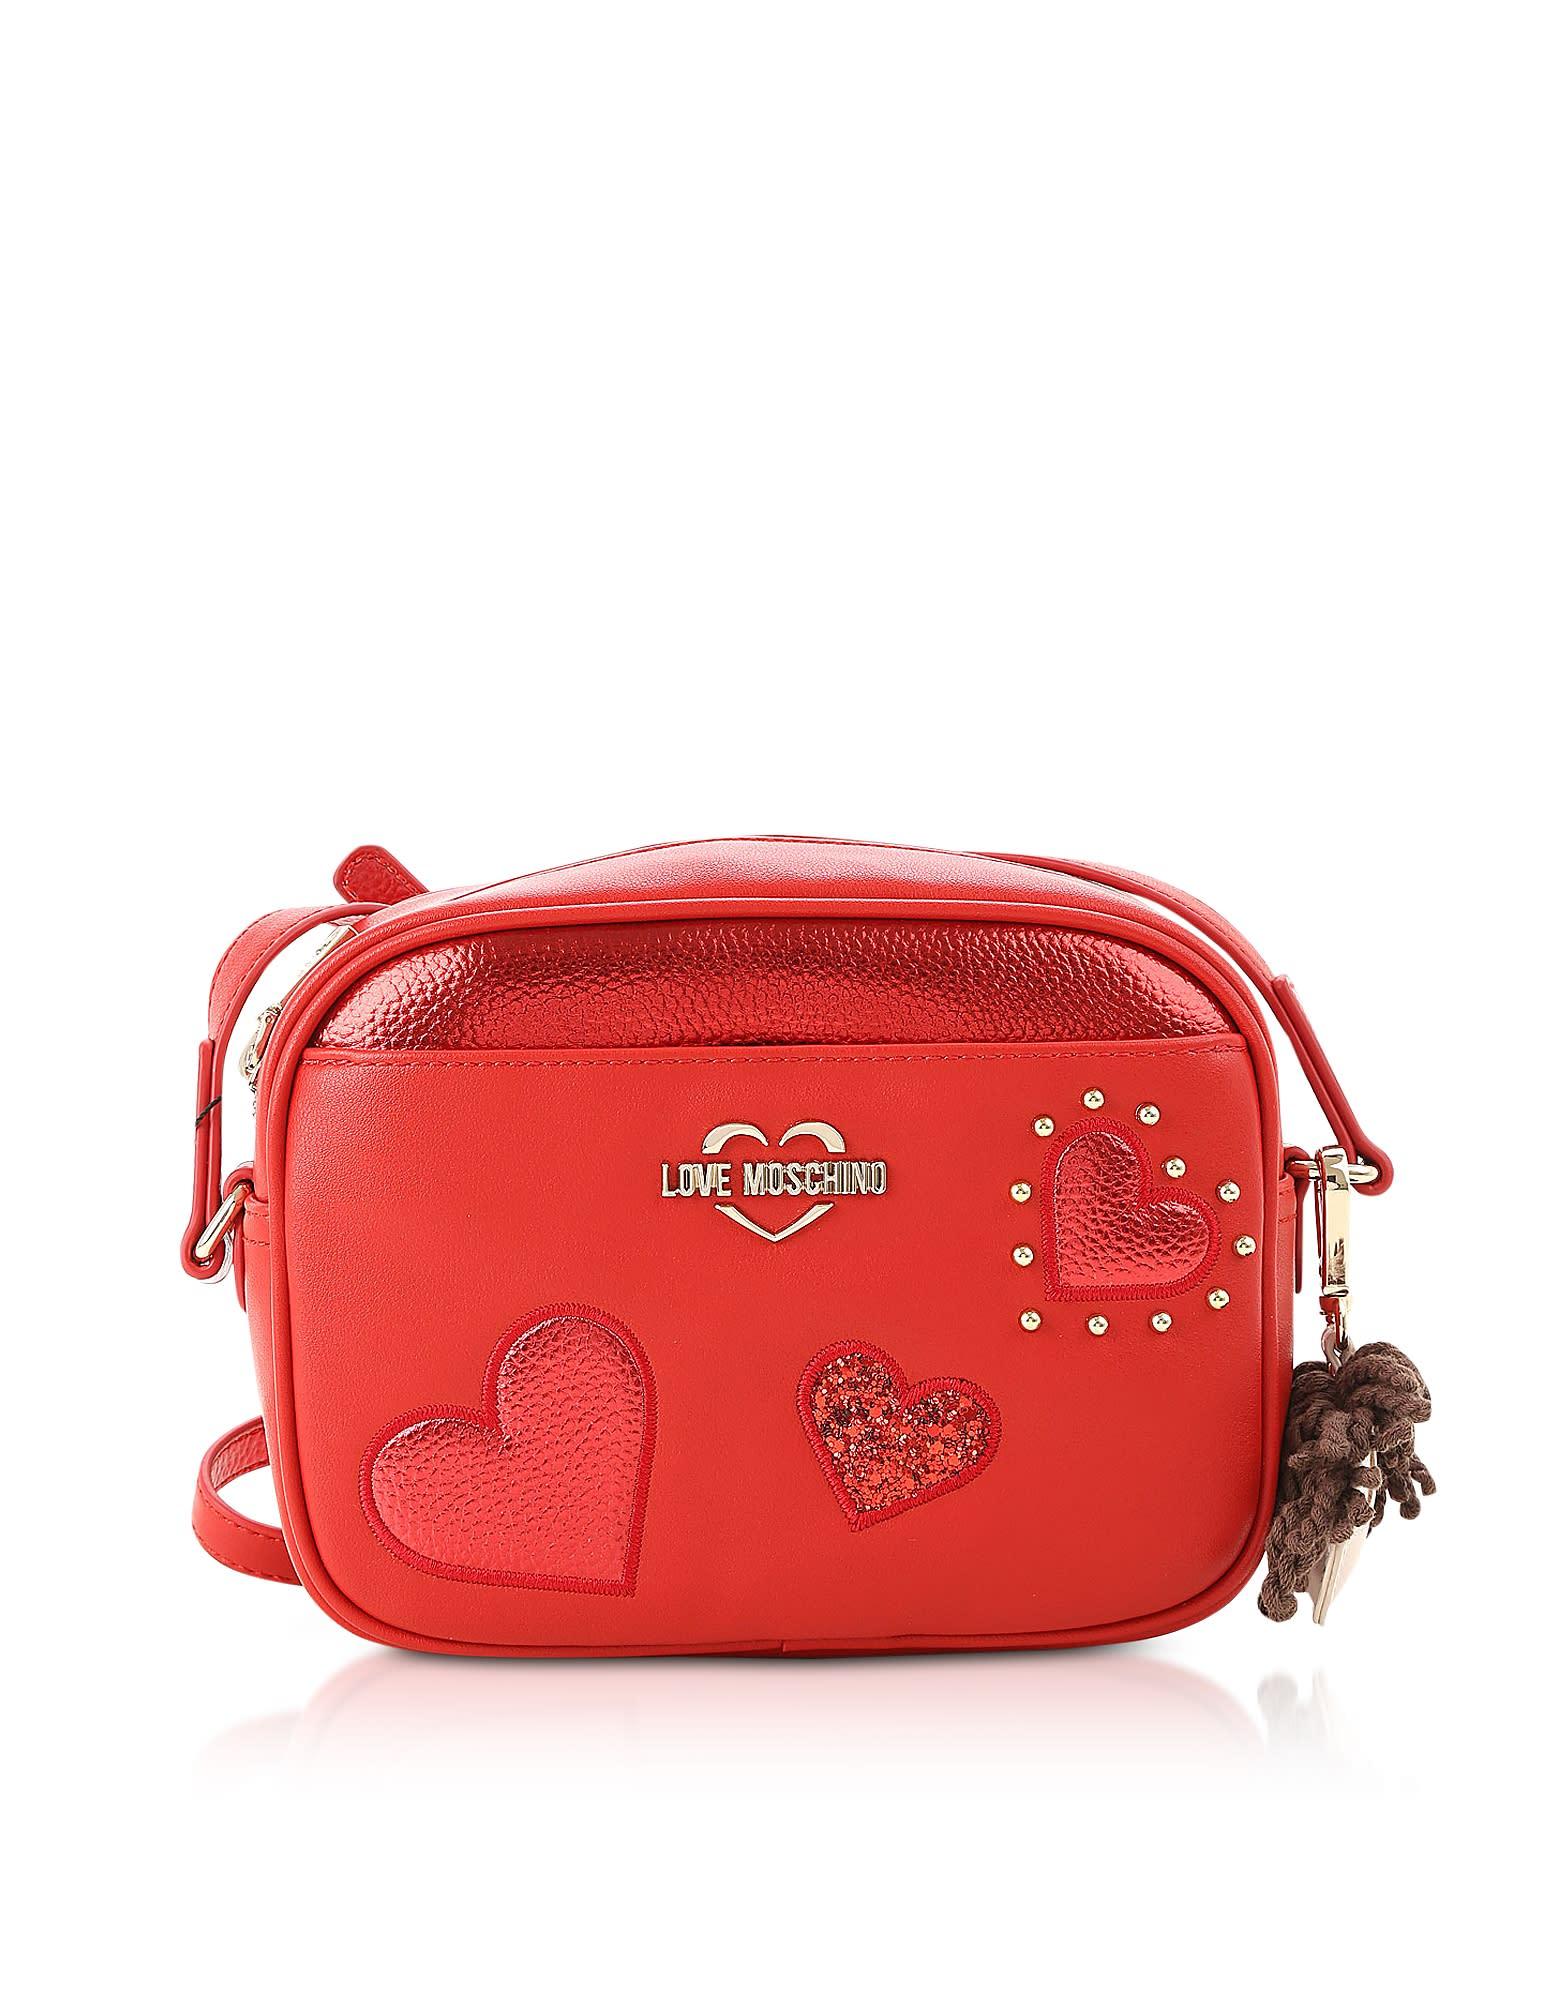 Love Moschino METALLIC RED GRAINY ECO-LEATHER CAMERA BAG